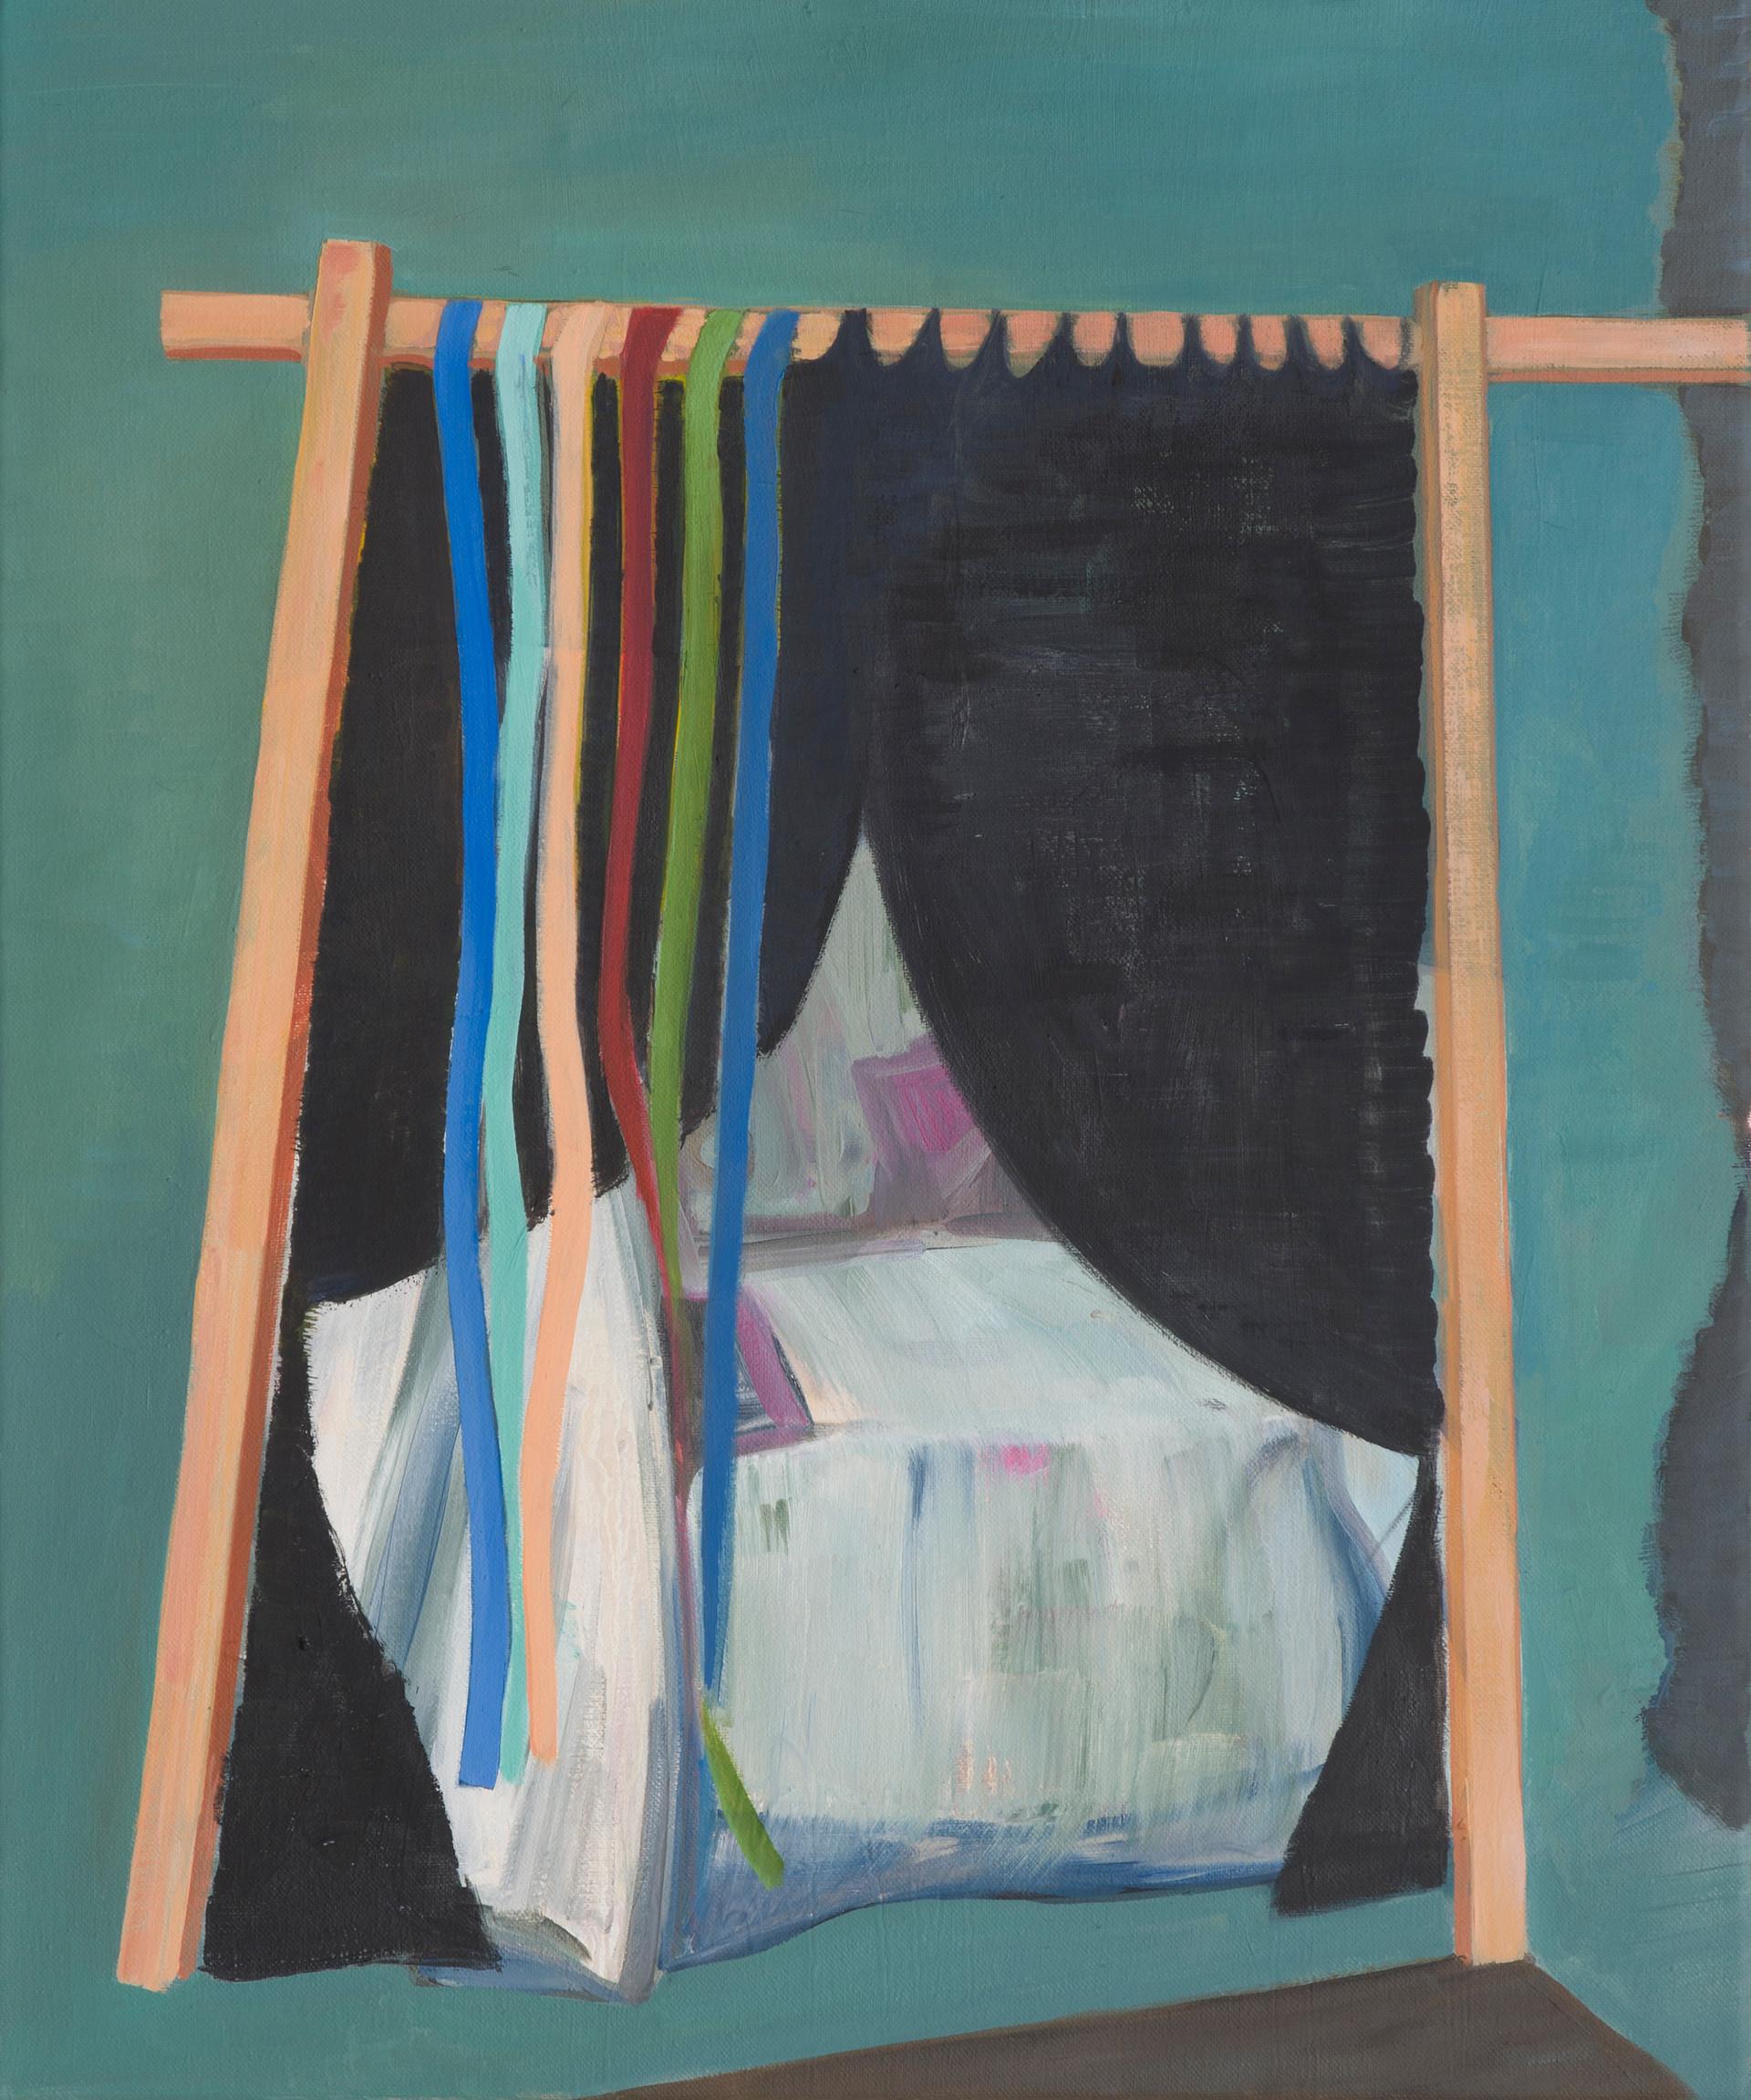 bedroom - 2014 - öl auf leinwand - 60 x 50 cm